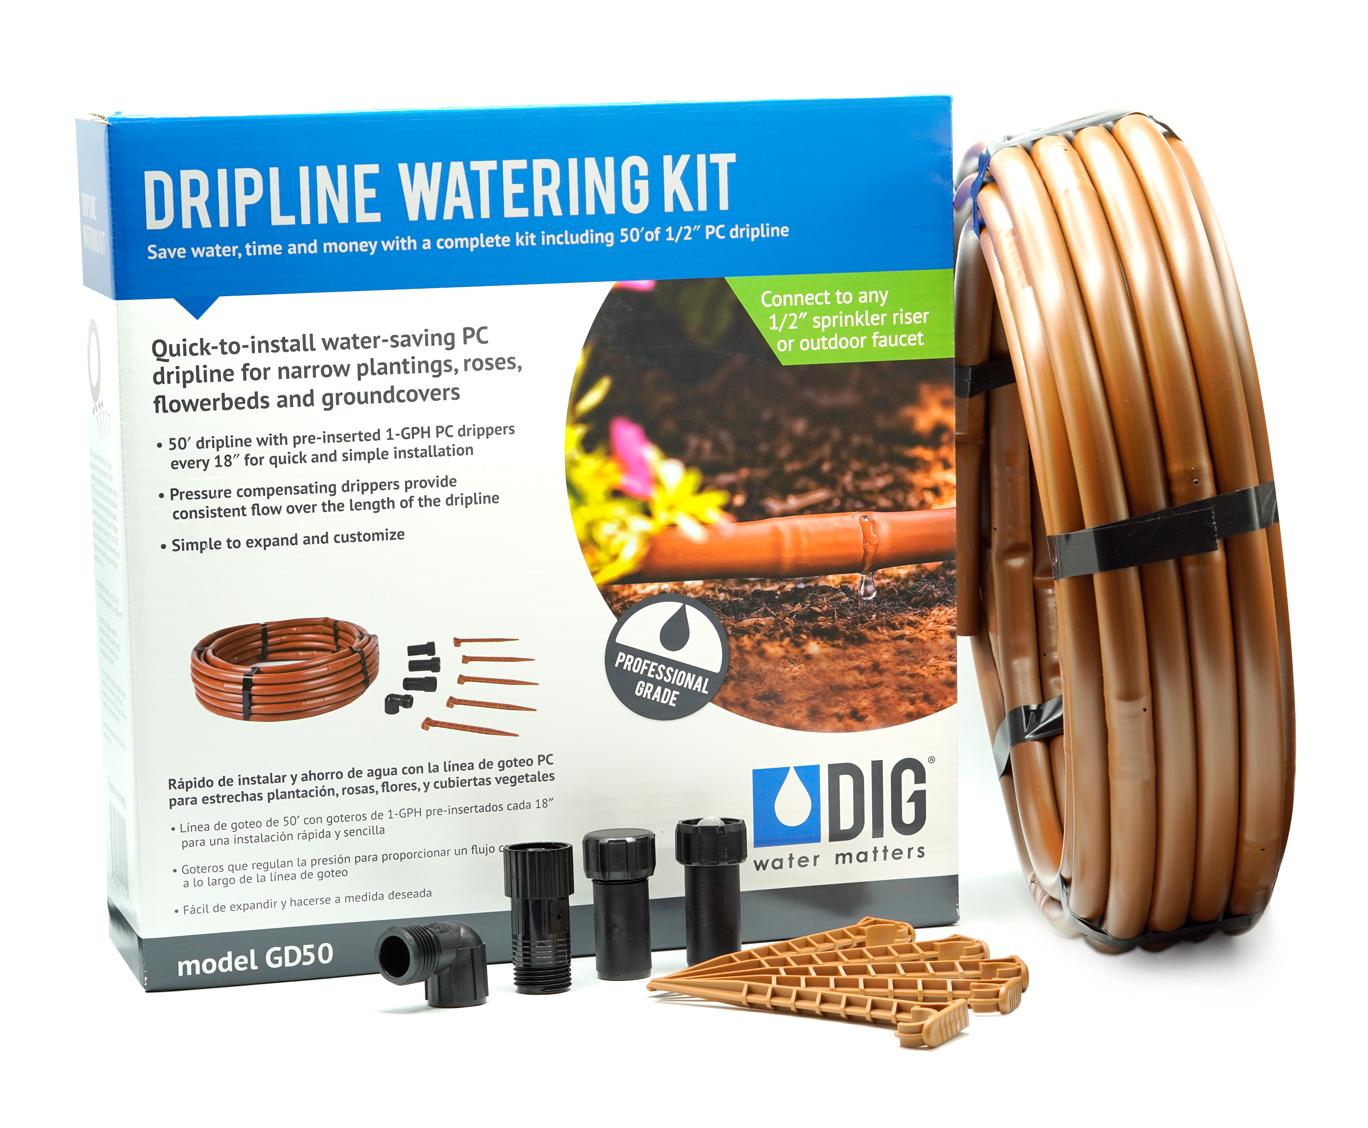 GD50 PC Dripline Watering Kit